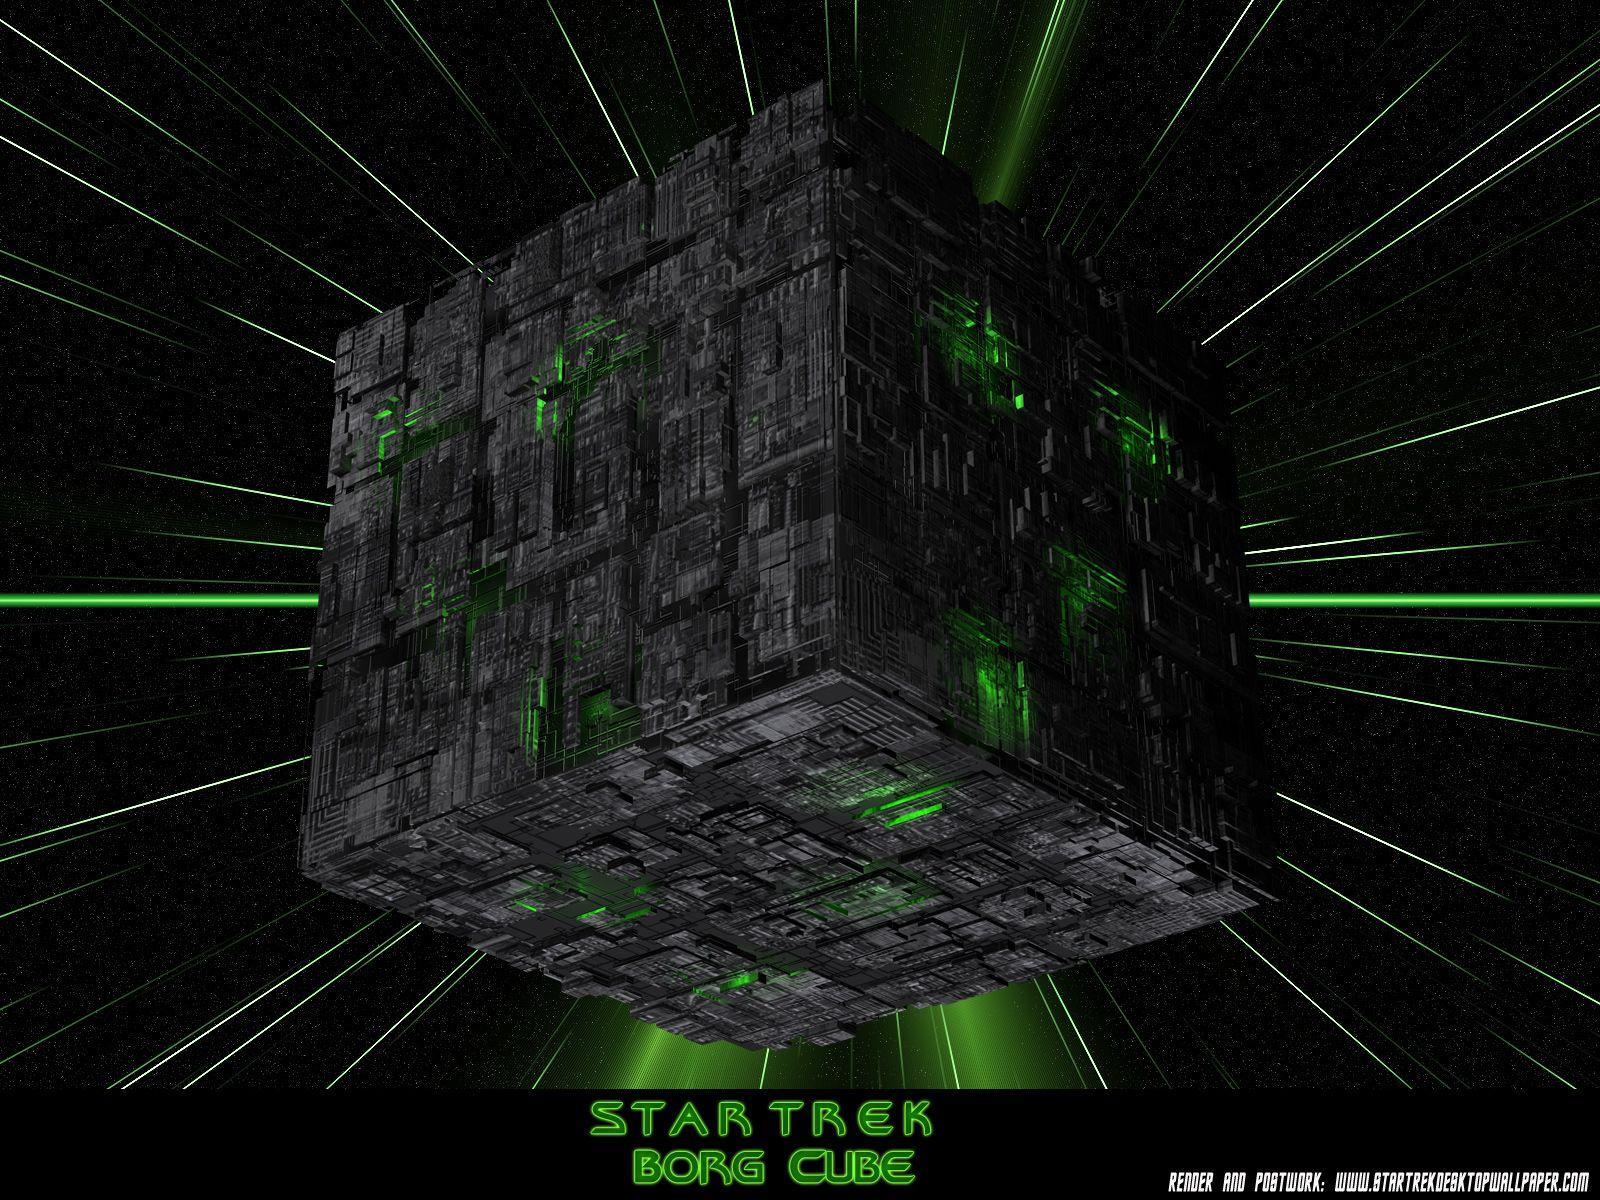 Star Trek Borg Cube Wallpapers Wallpaper Cave